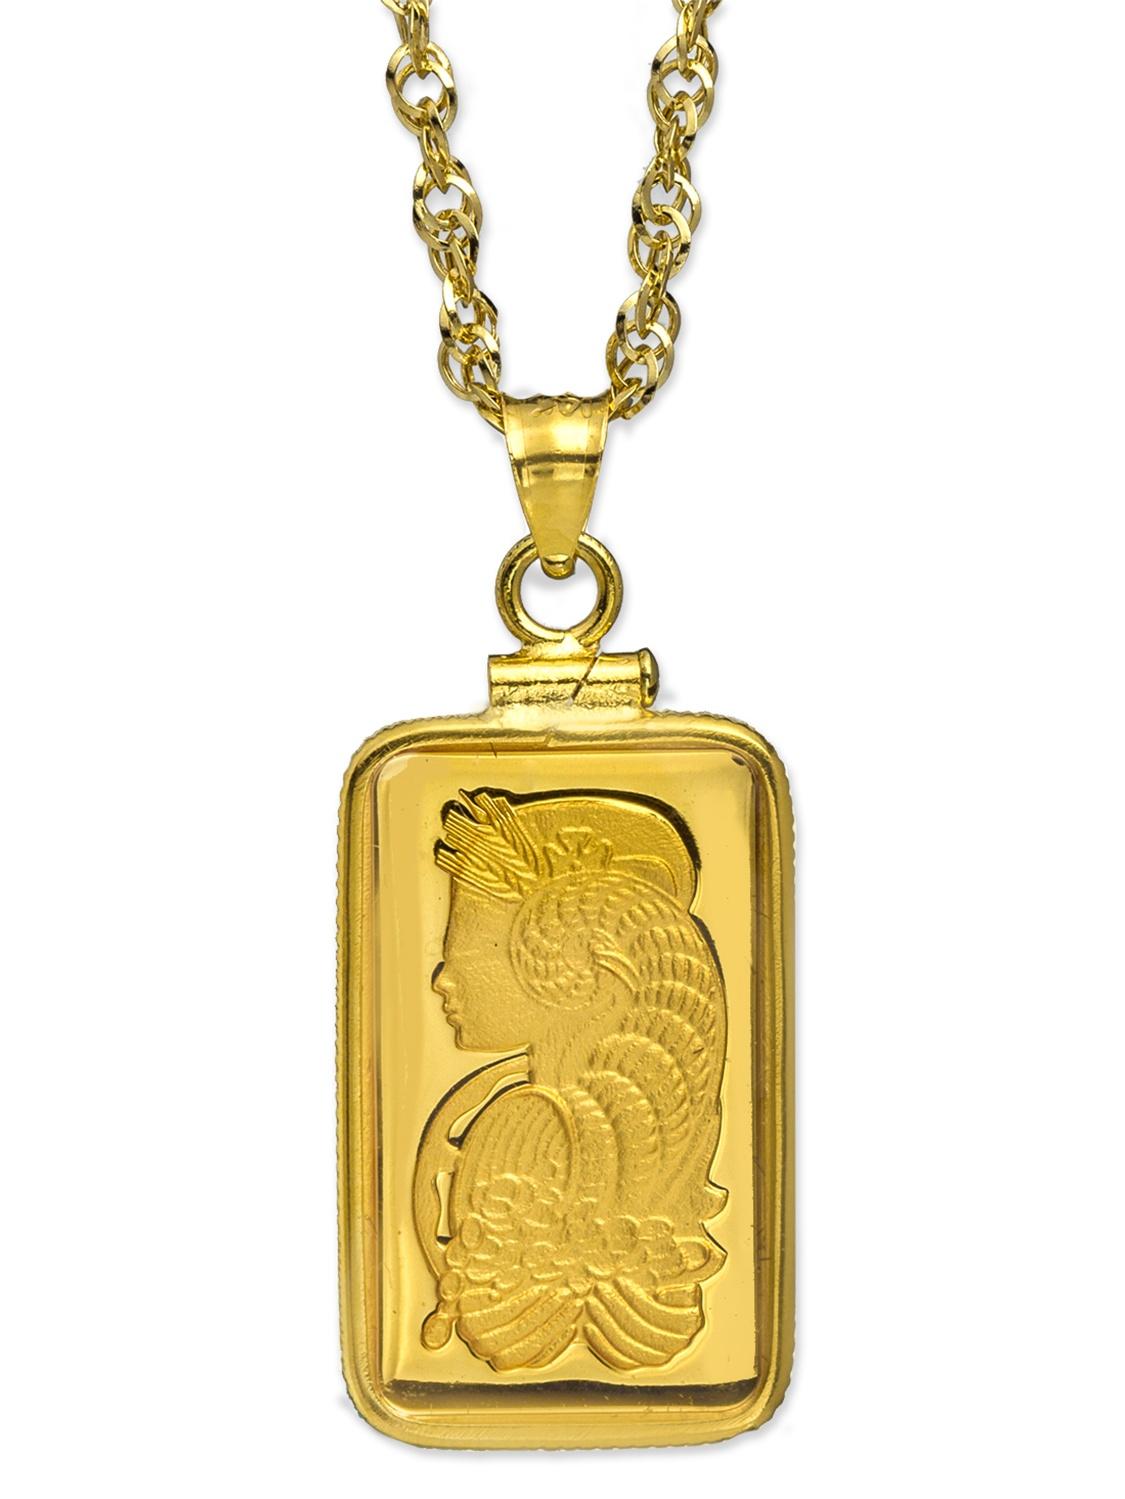 5 gram Gold Pendant - PAMP Suisse Fortuna (w/Chain)